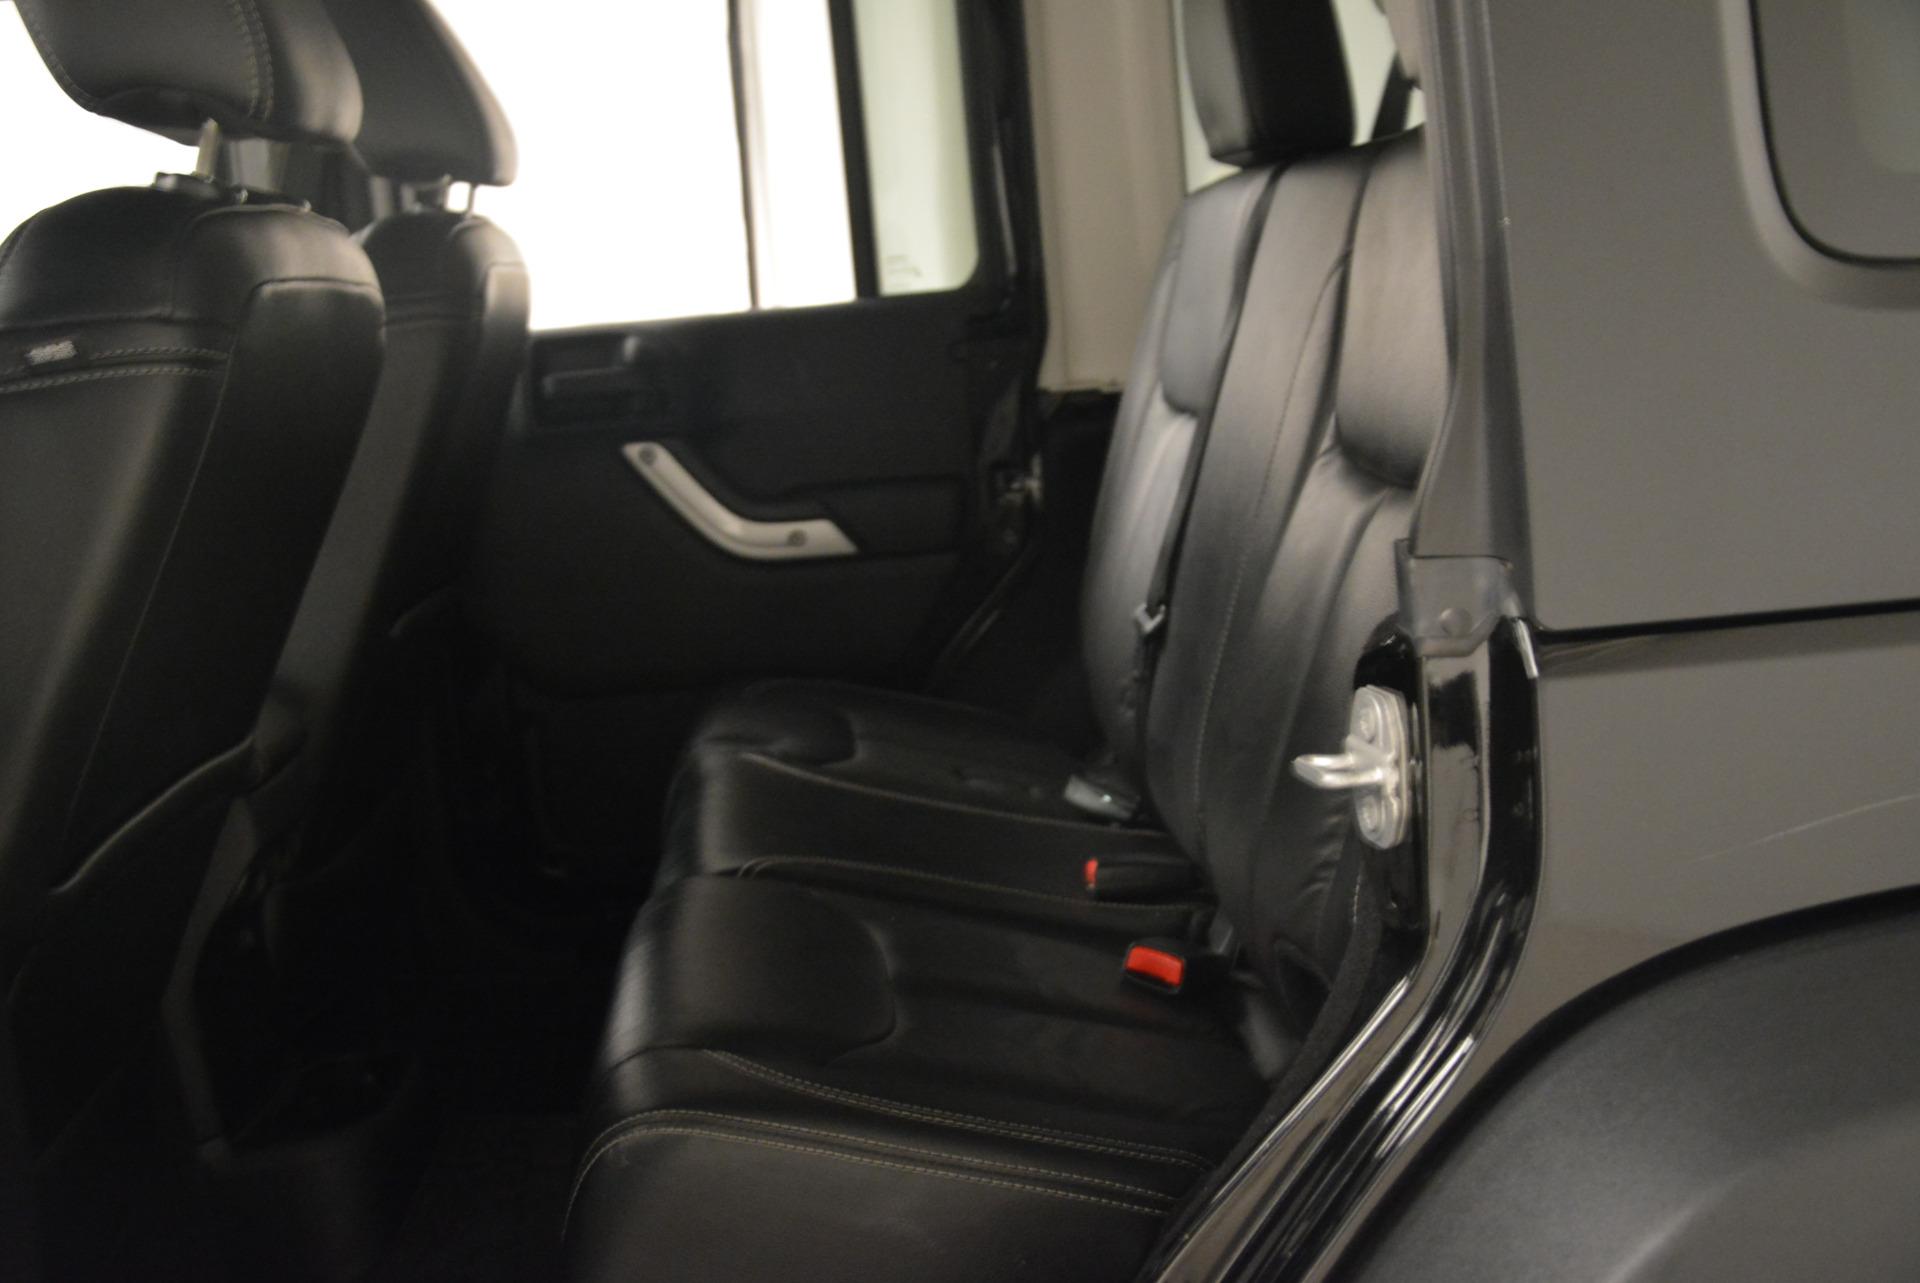 Used 2016 Jeep Wrangler Unlimited Rubicon For Sale In Greenwich, CT. Alfa Romeo of Greenwich, 7345A 2218_p19